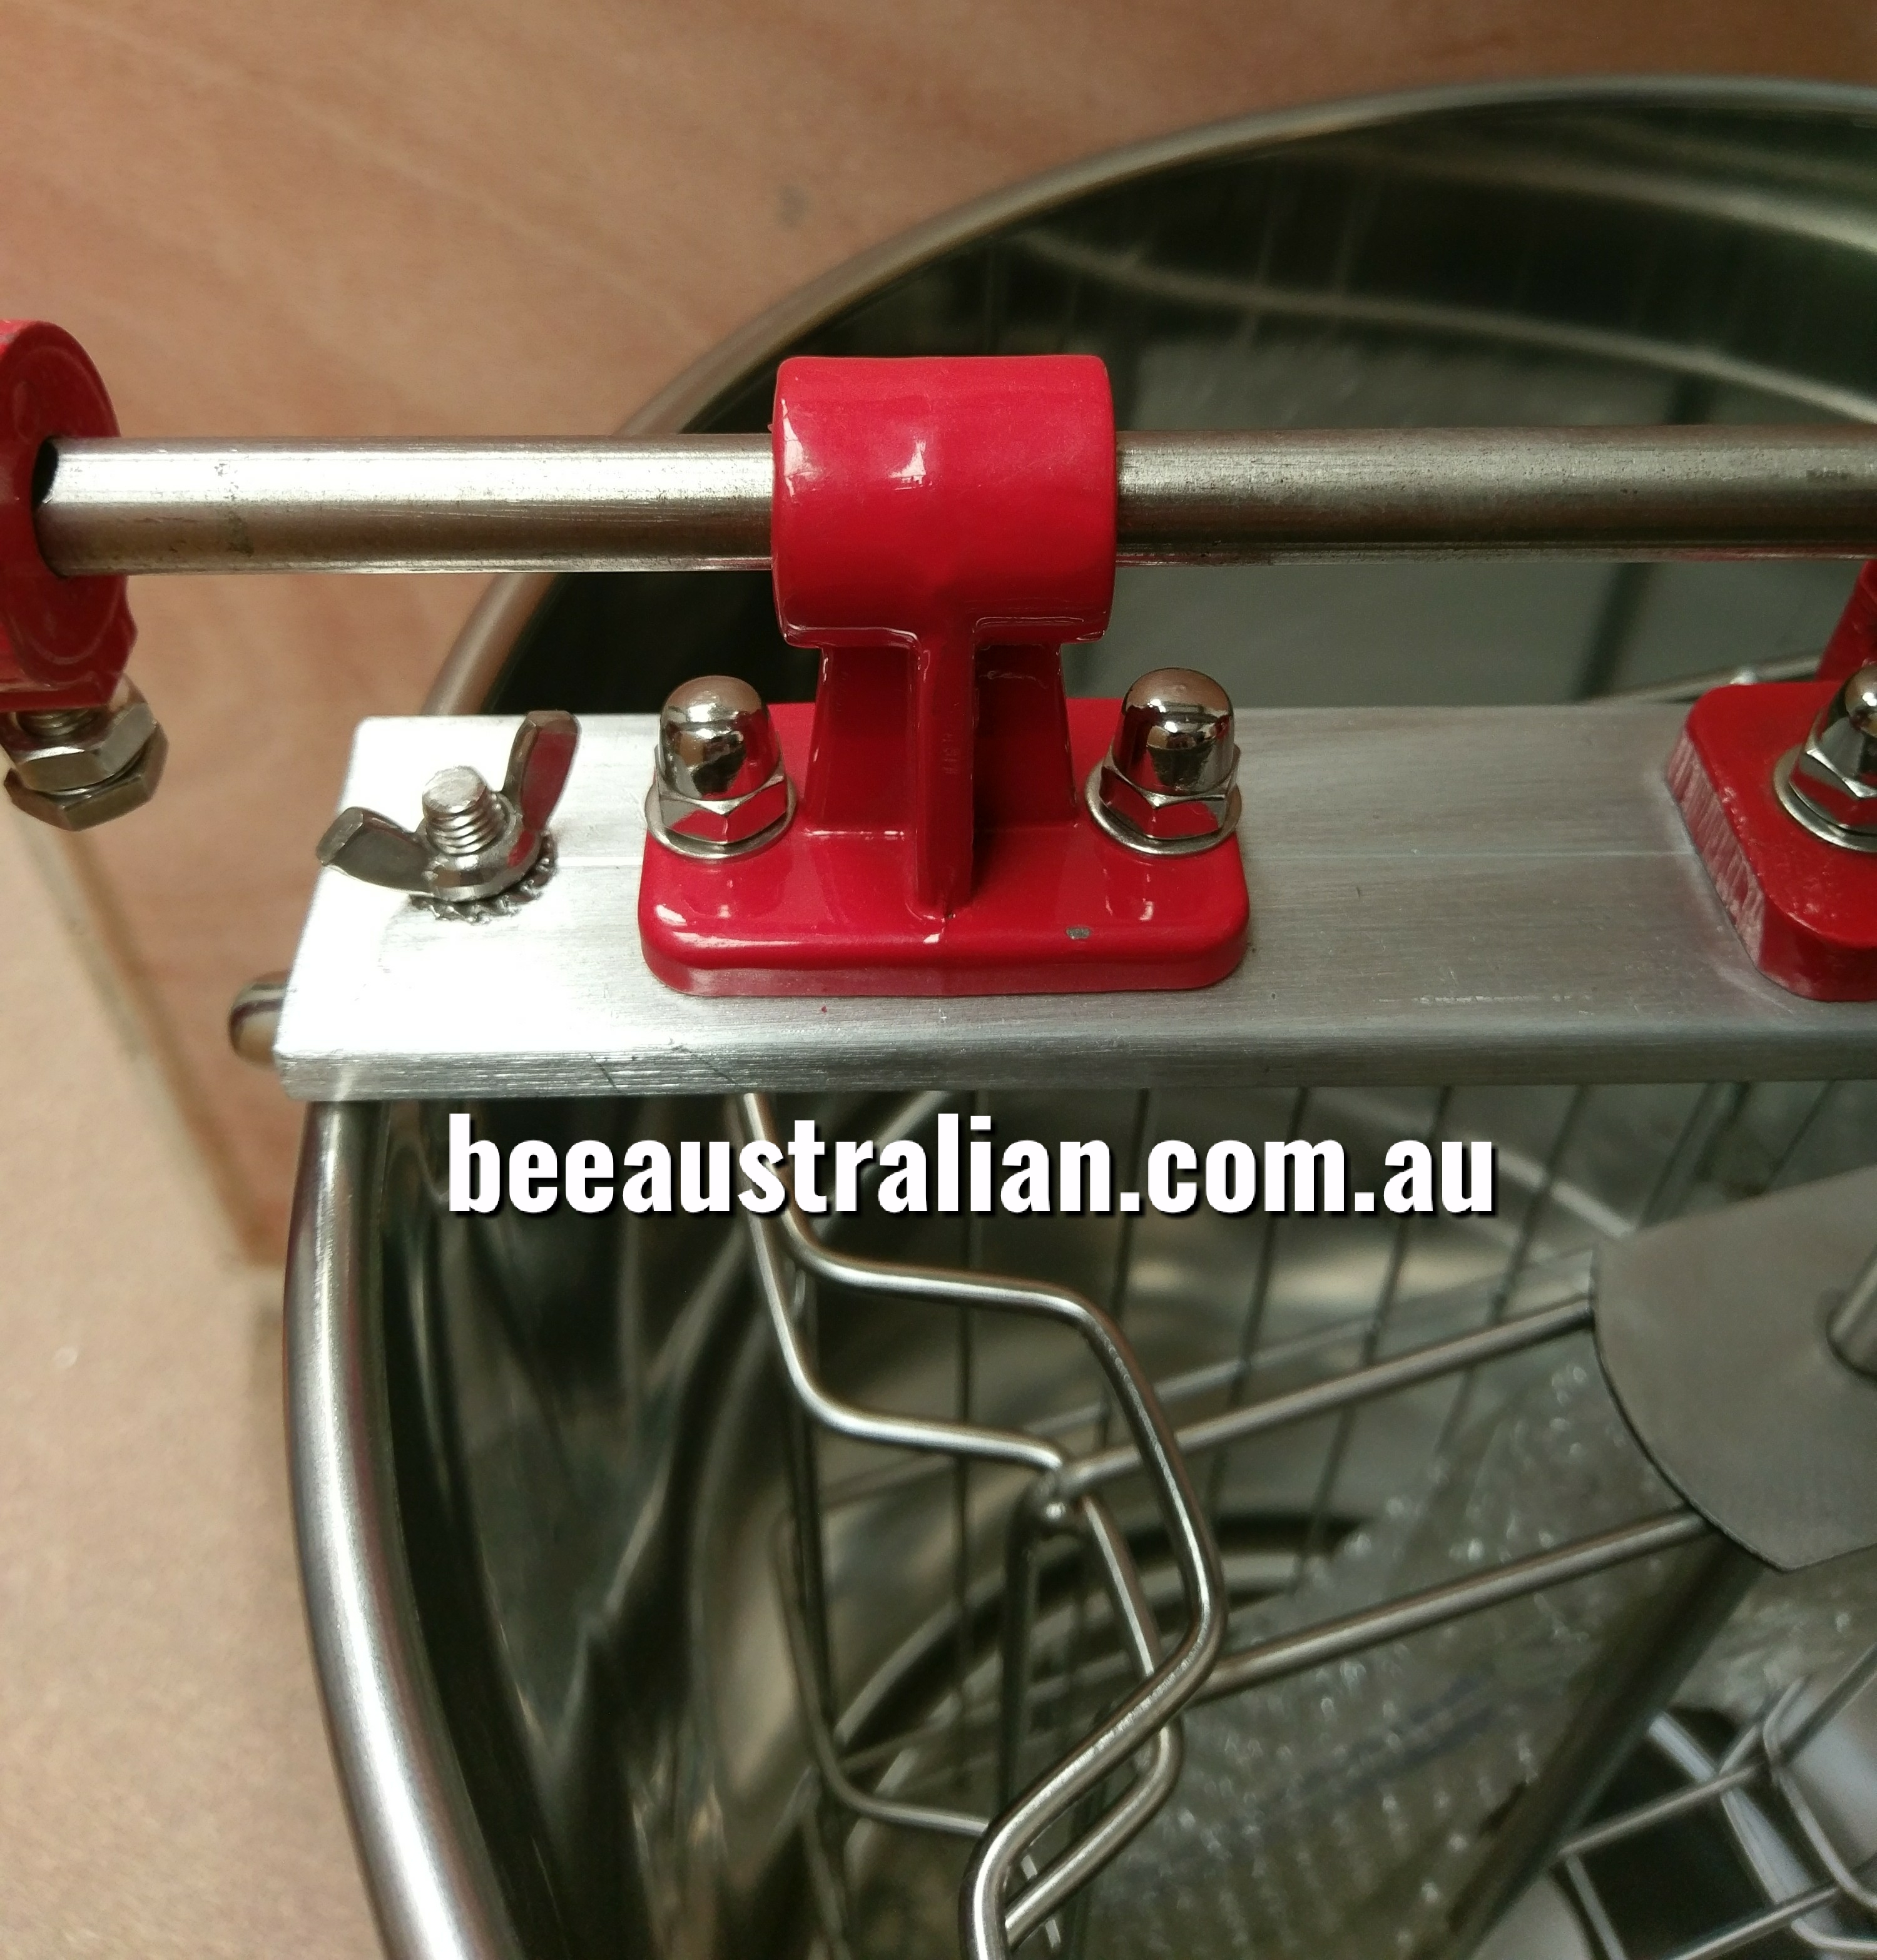 66db8fcbe11 Bee Australian 2 Frame Manual Honey Extractor SS - Bee Australian